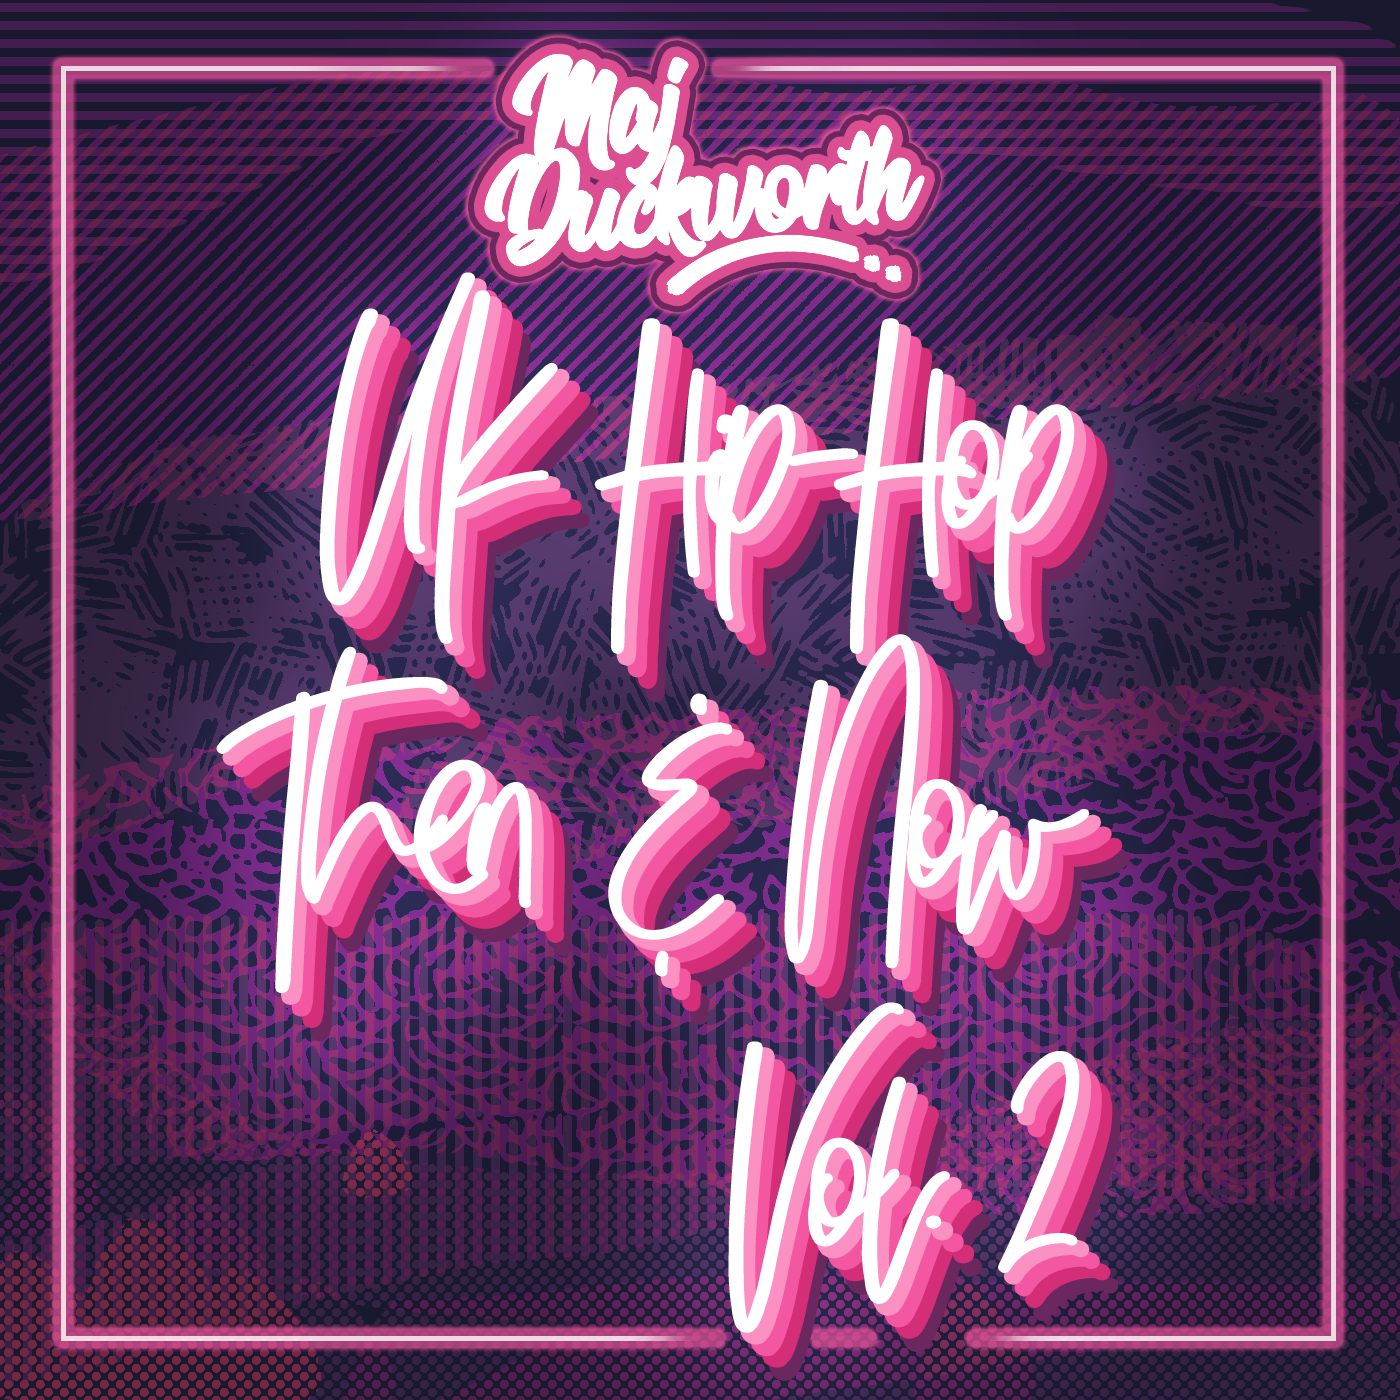 UK HipHop Then Now vol 2 ver 7.png